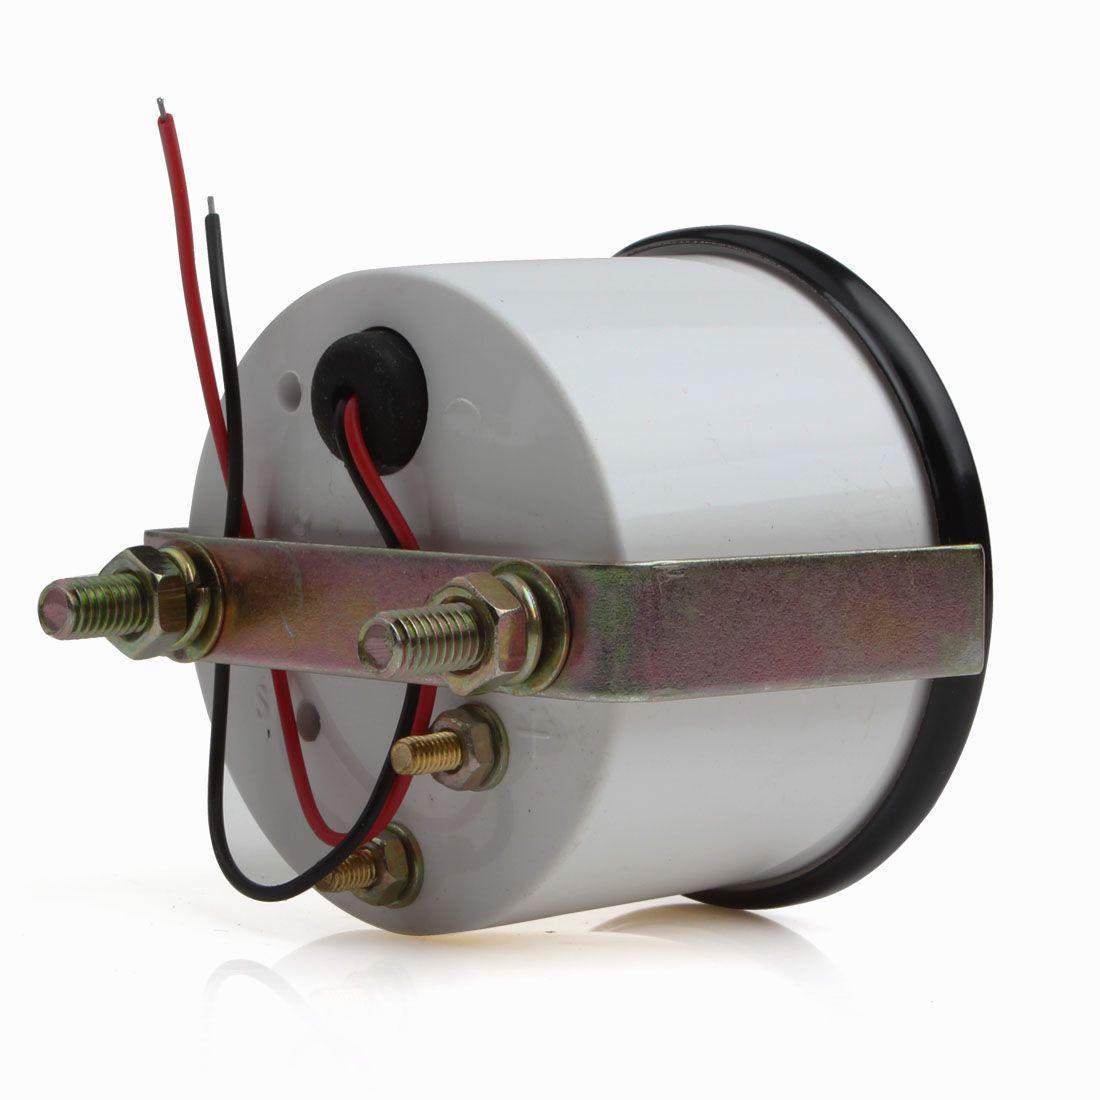 Brand New Universal 2 Inch Black Color 52mm Voltmeter Gauge Meter for 8-16V Auto Power Measure CEC_541